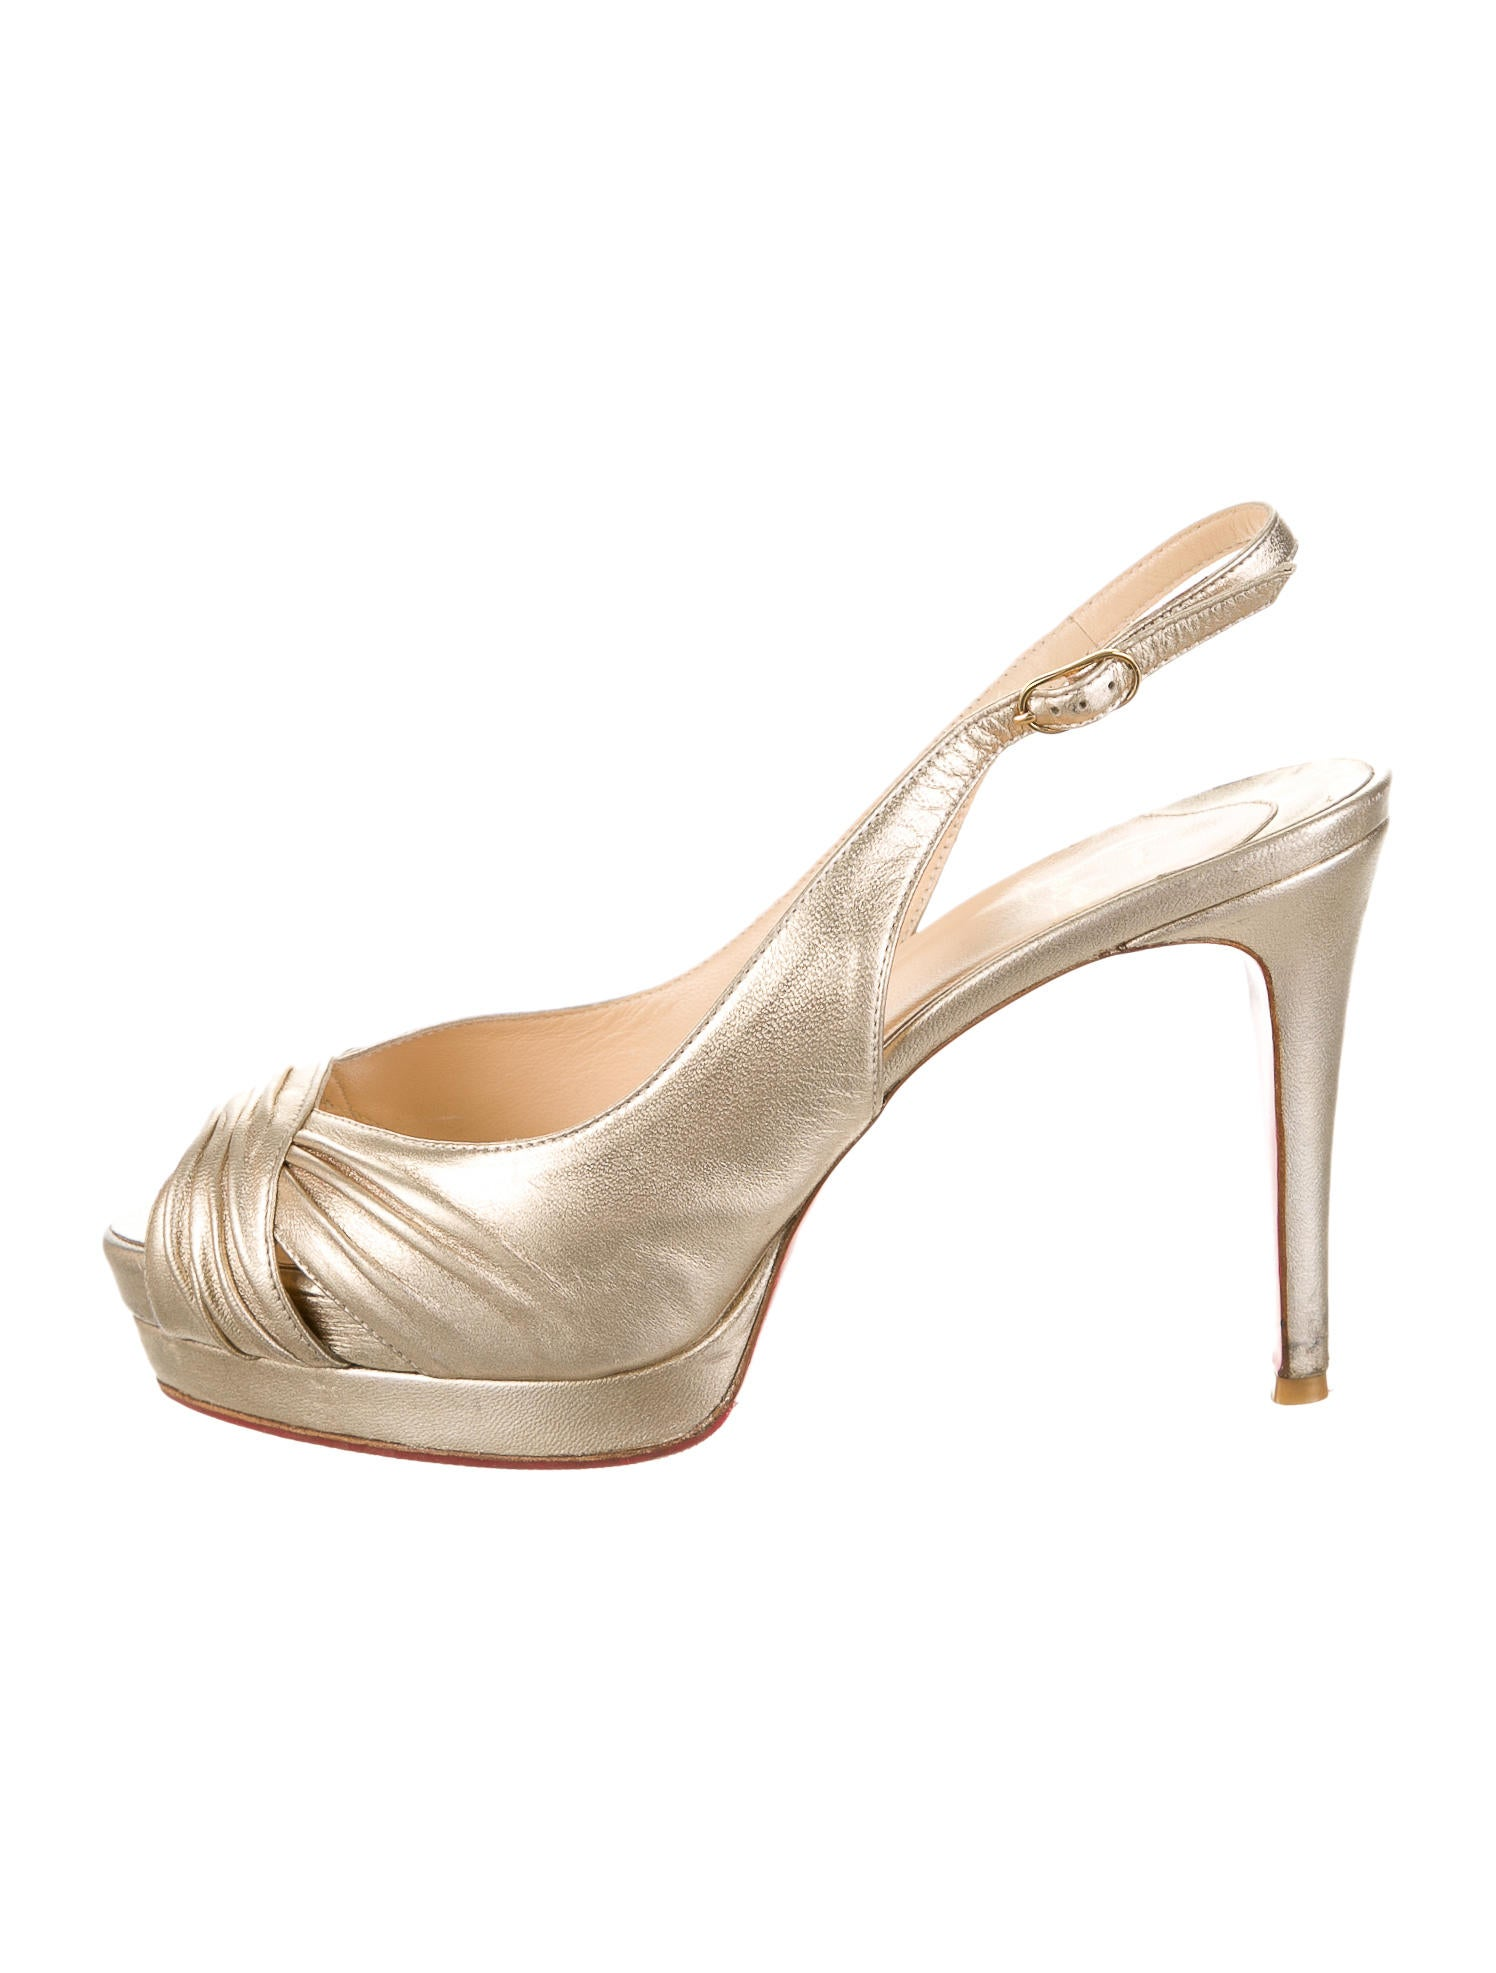 louboutin loafer - christian louboutin peep-toe pumps Metallic gold-tone leather ...